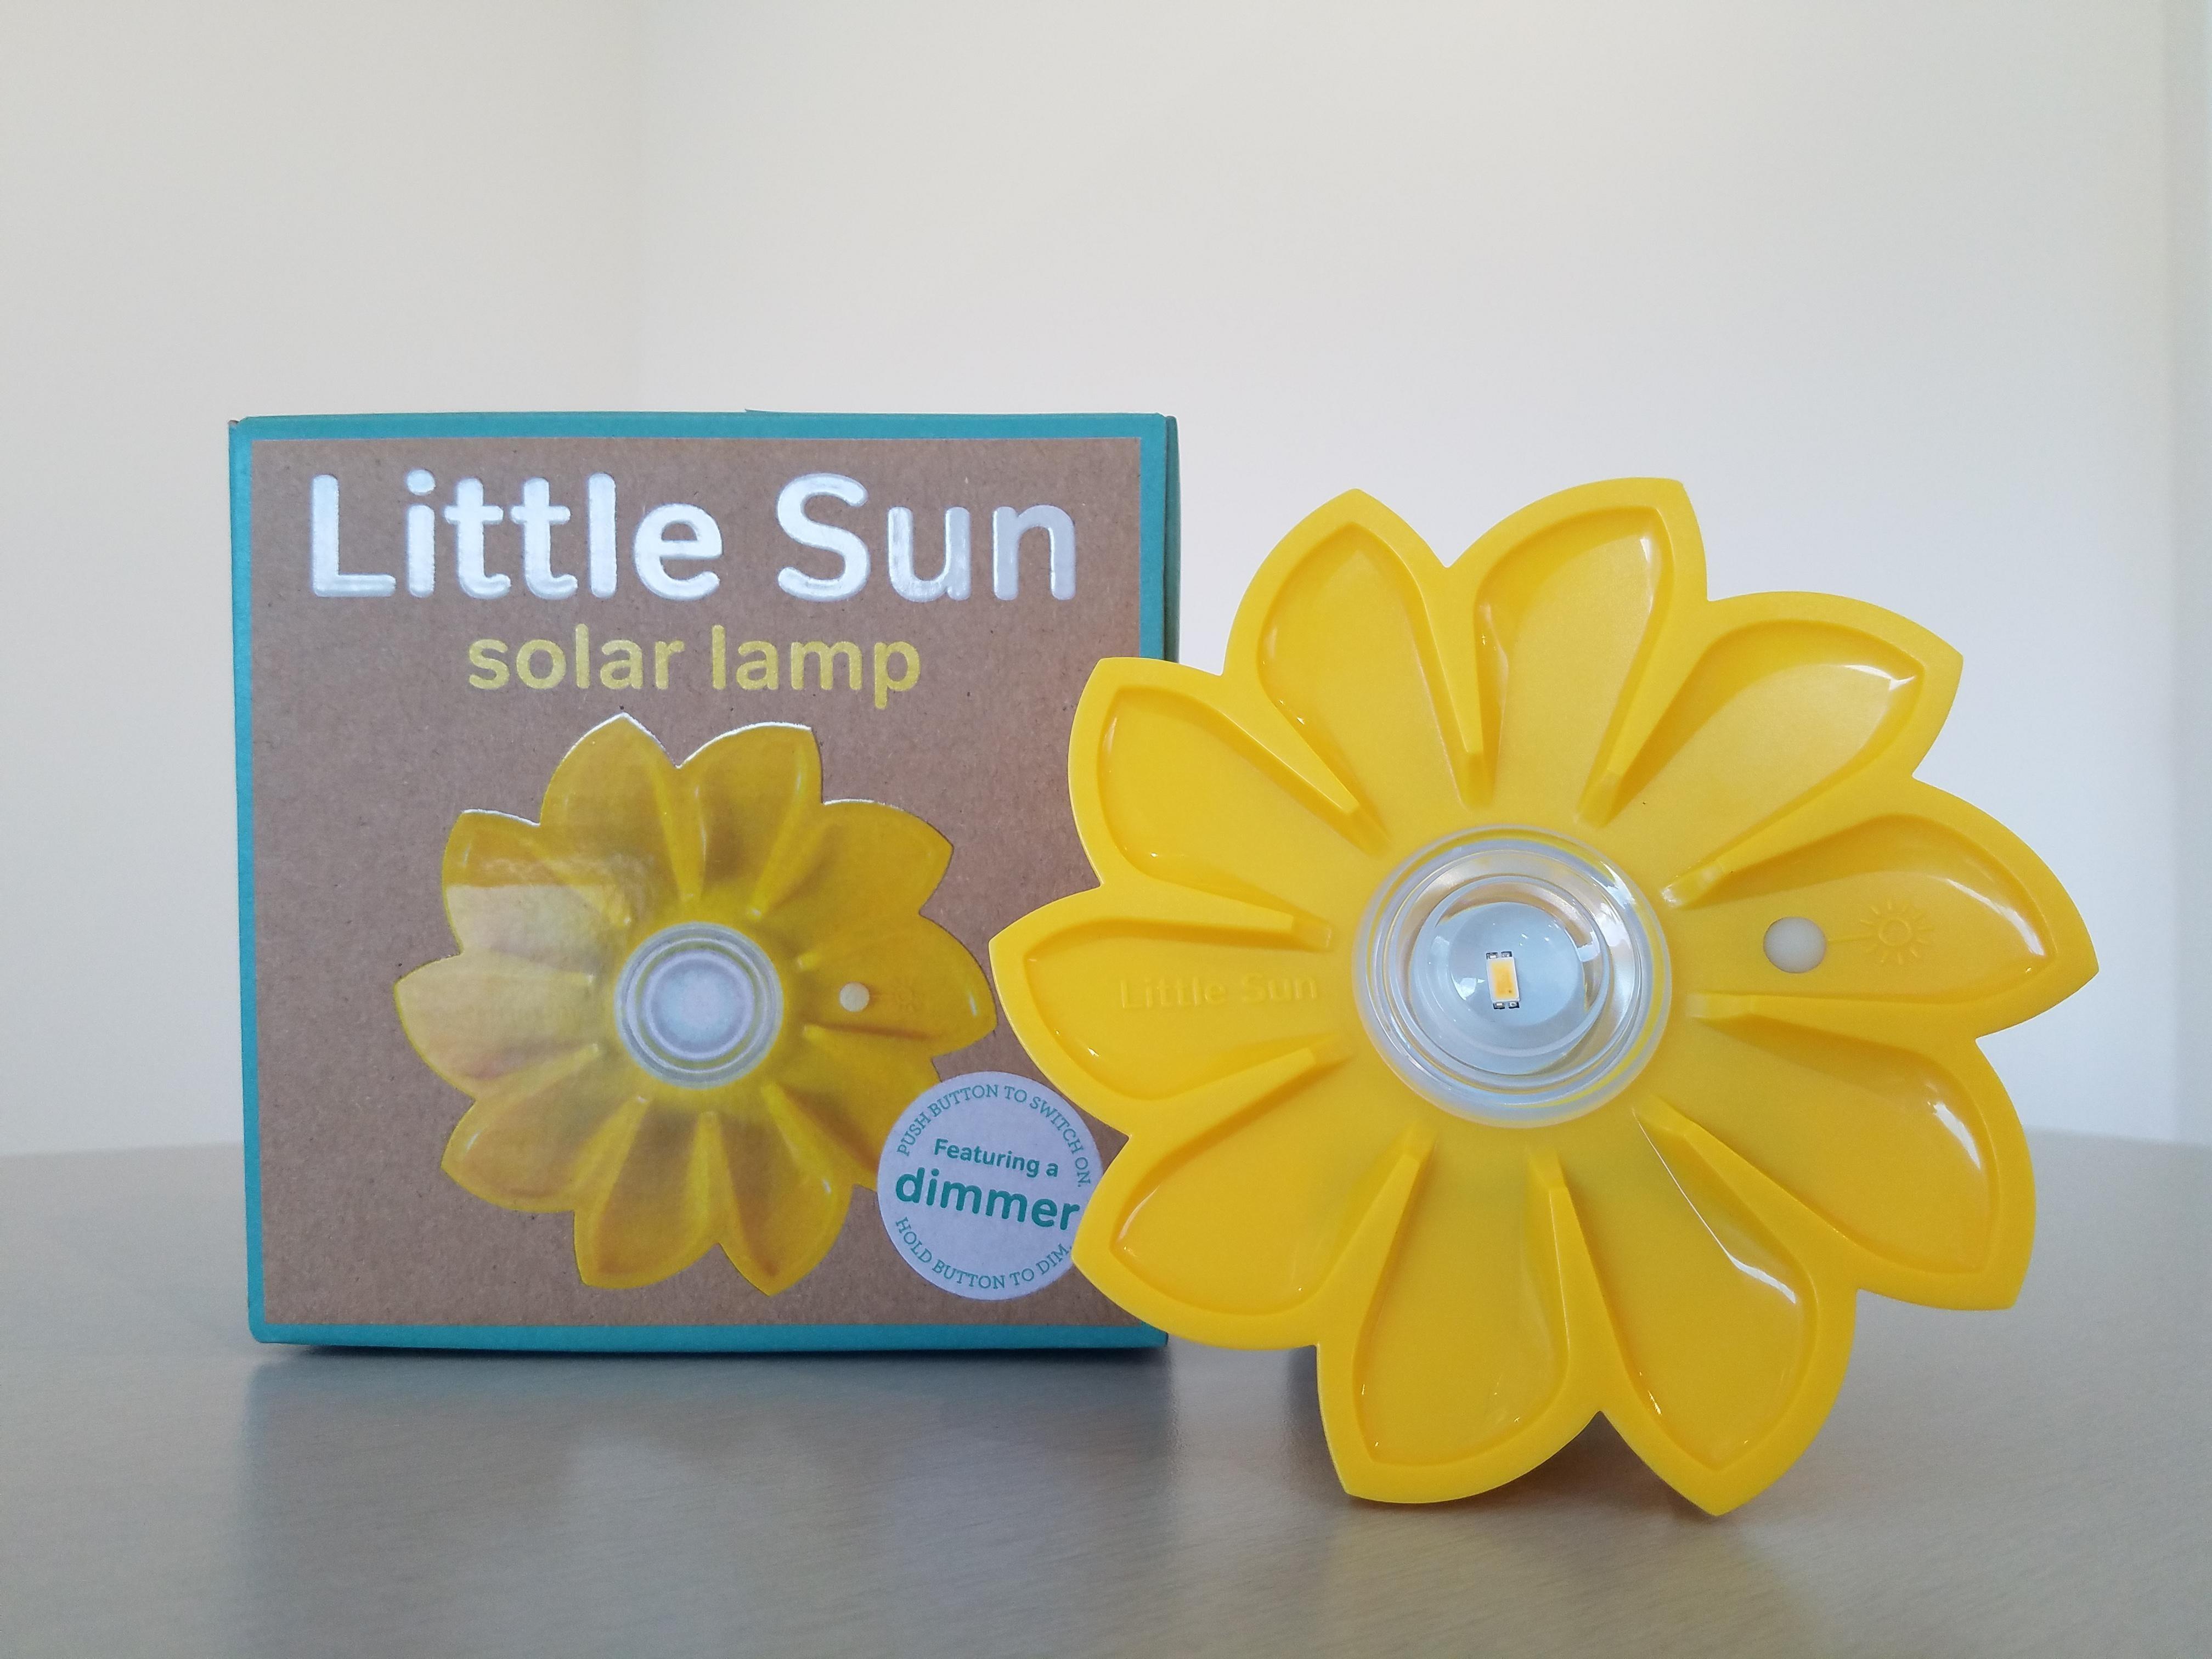 An image of a plastic solar lamp shaped like a cartoon sun